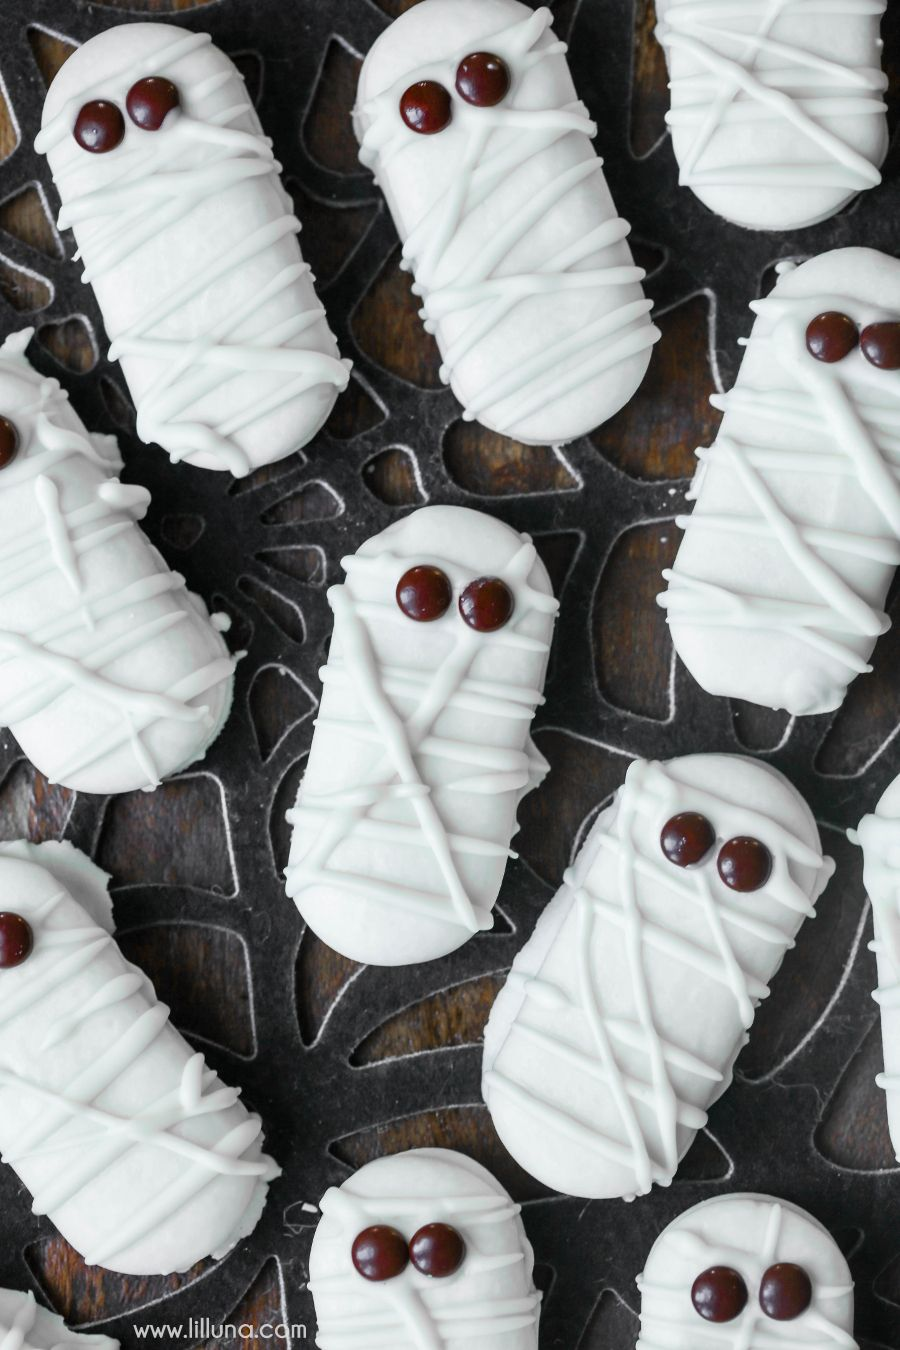 mummy cookies.jpg